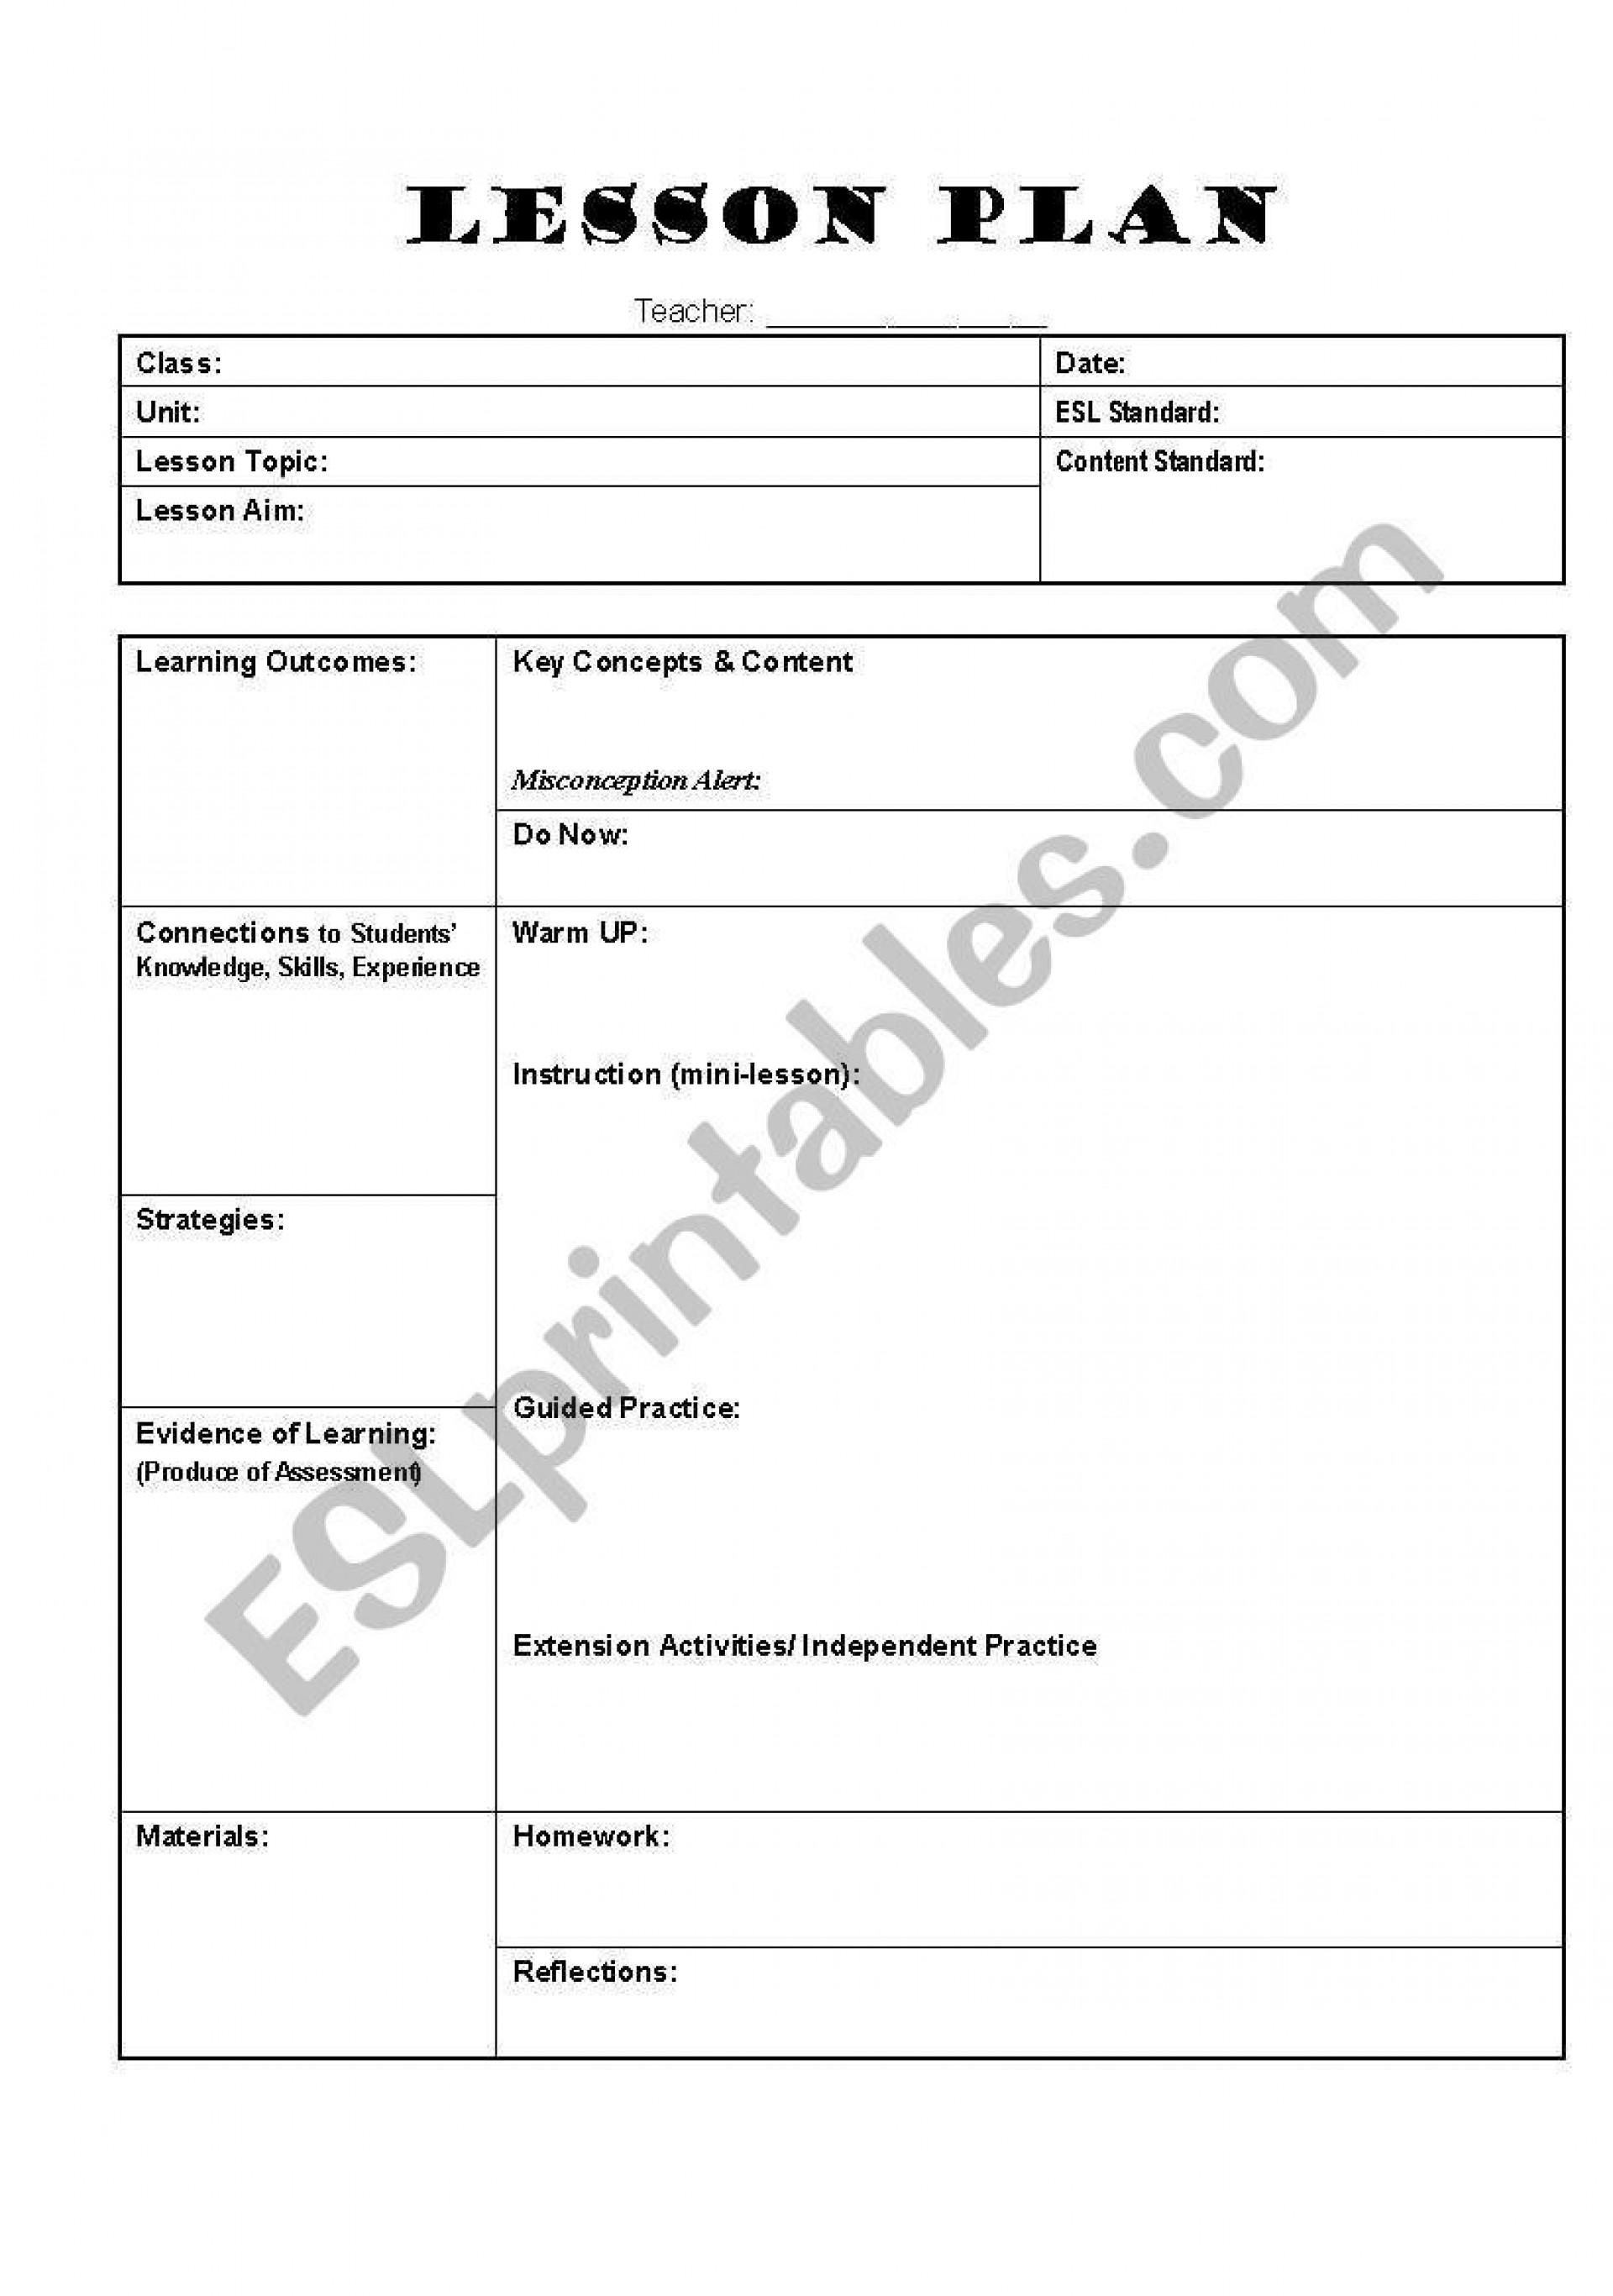 001 Singular Editable Lesson Plan Template High Definition  Templates For Preschool Word Free1920